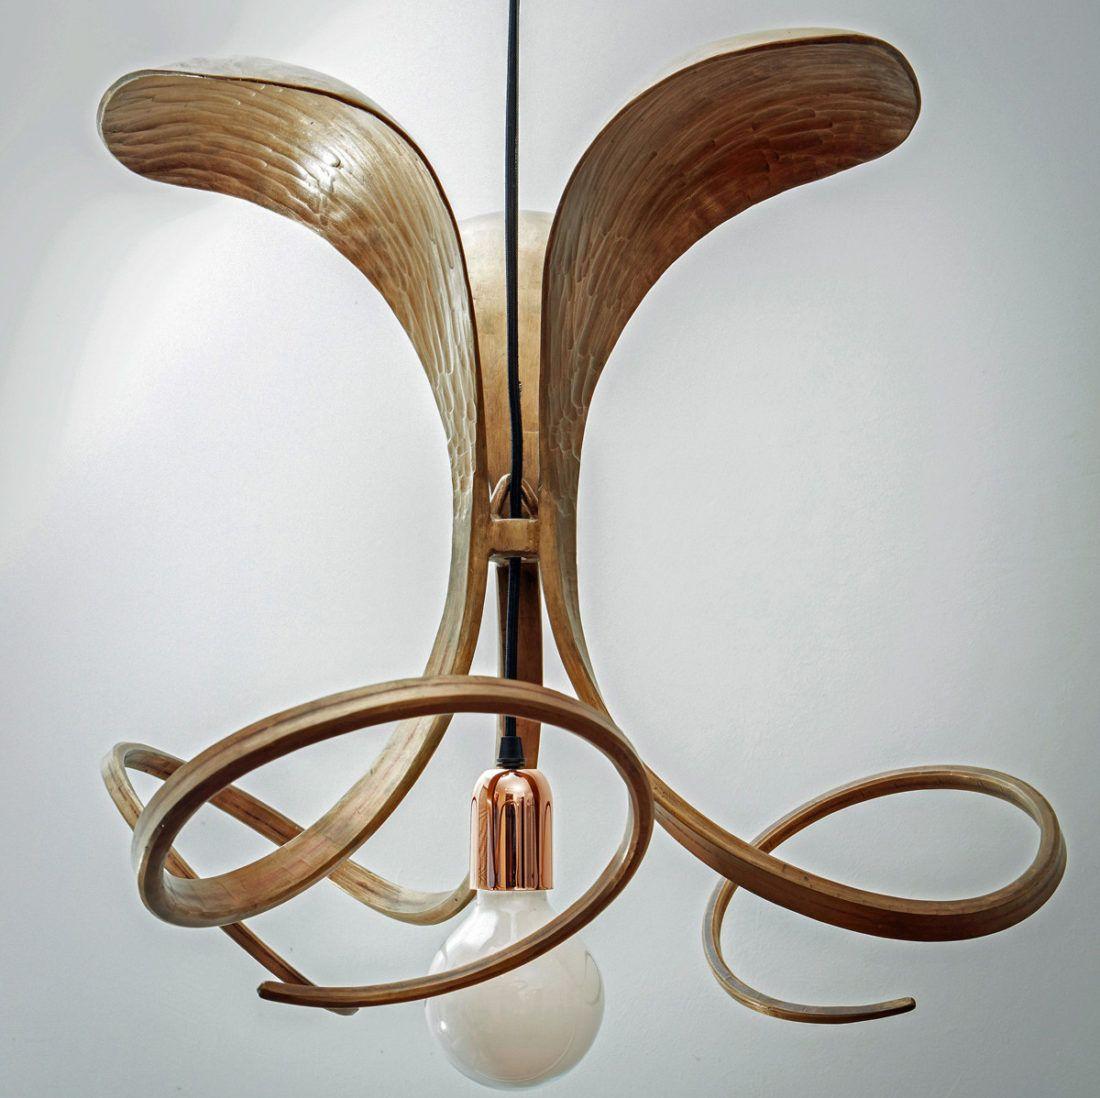 Forged bronze sculptural light fitting